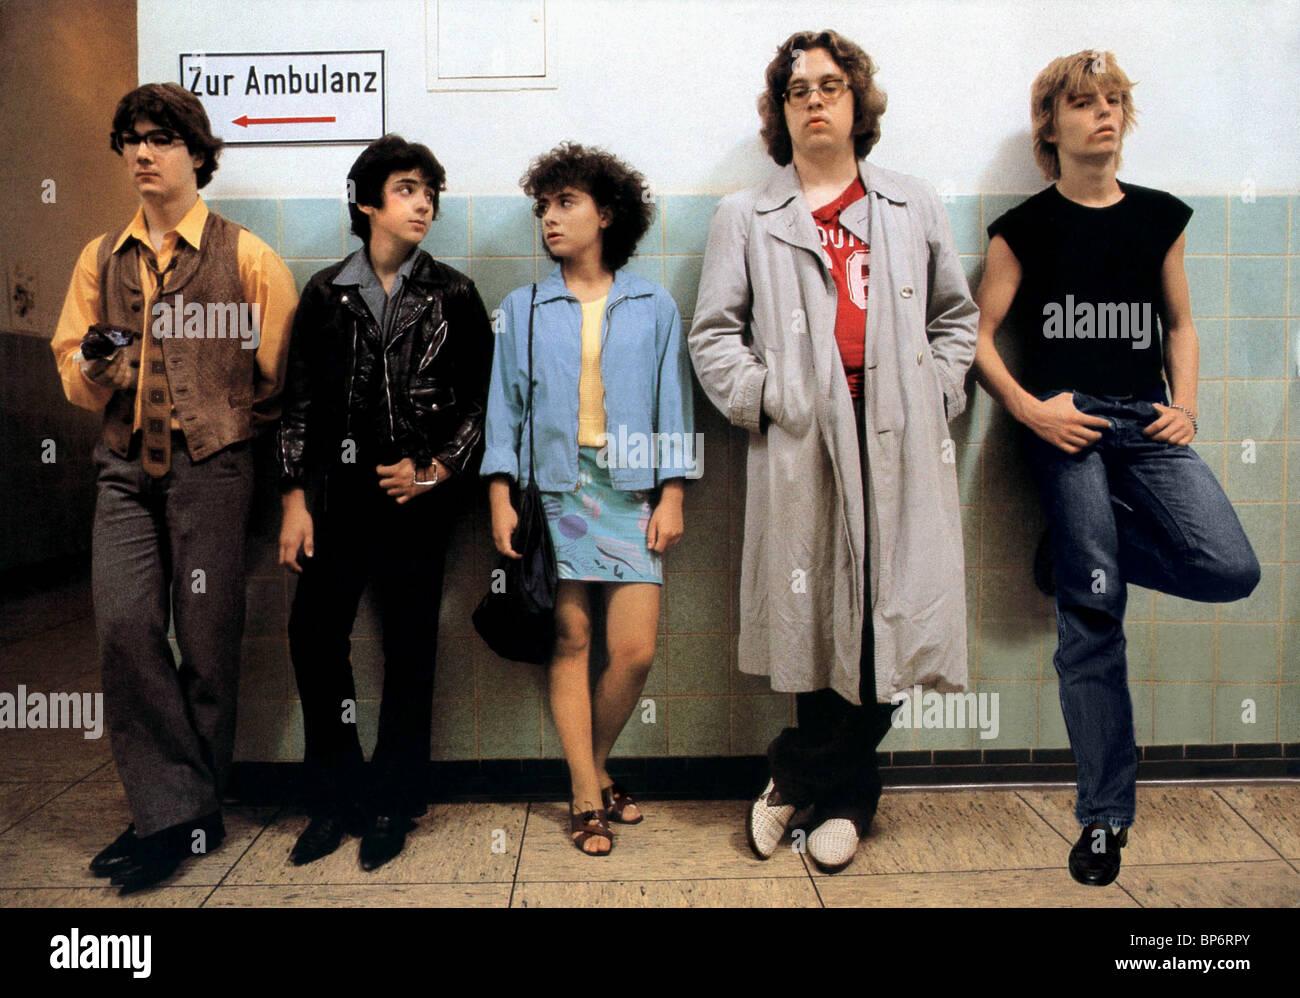 HARTMUT ISSELHORST, MICHAEL KLEIN, MARY KETIKIDO, MARK EICHENSEHER, SASCHA DISSELKAMP, THE HEARTBREAKERS, 1983 - Stock Image